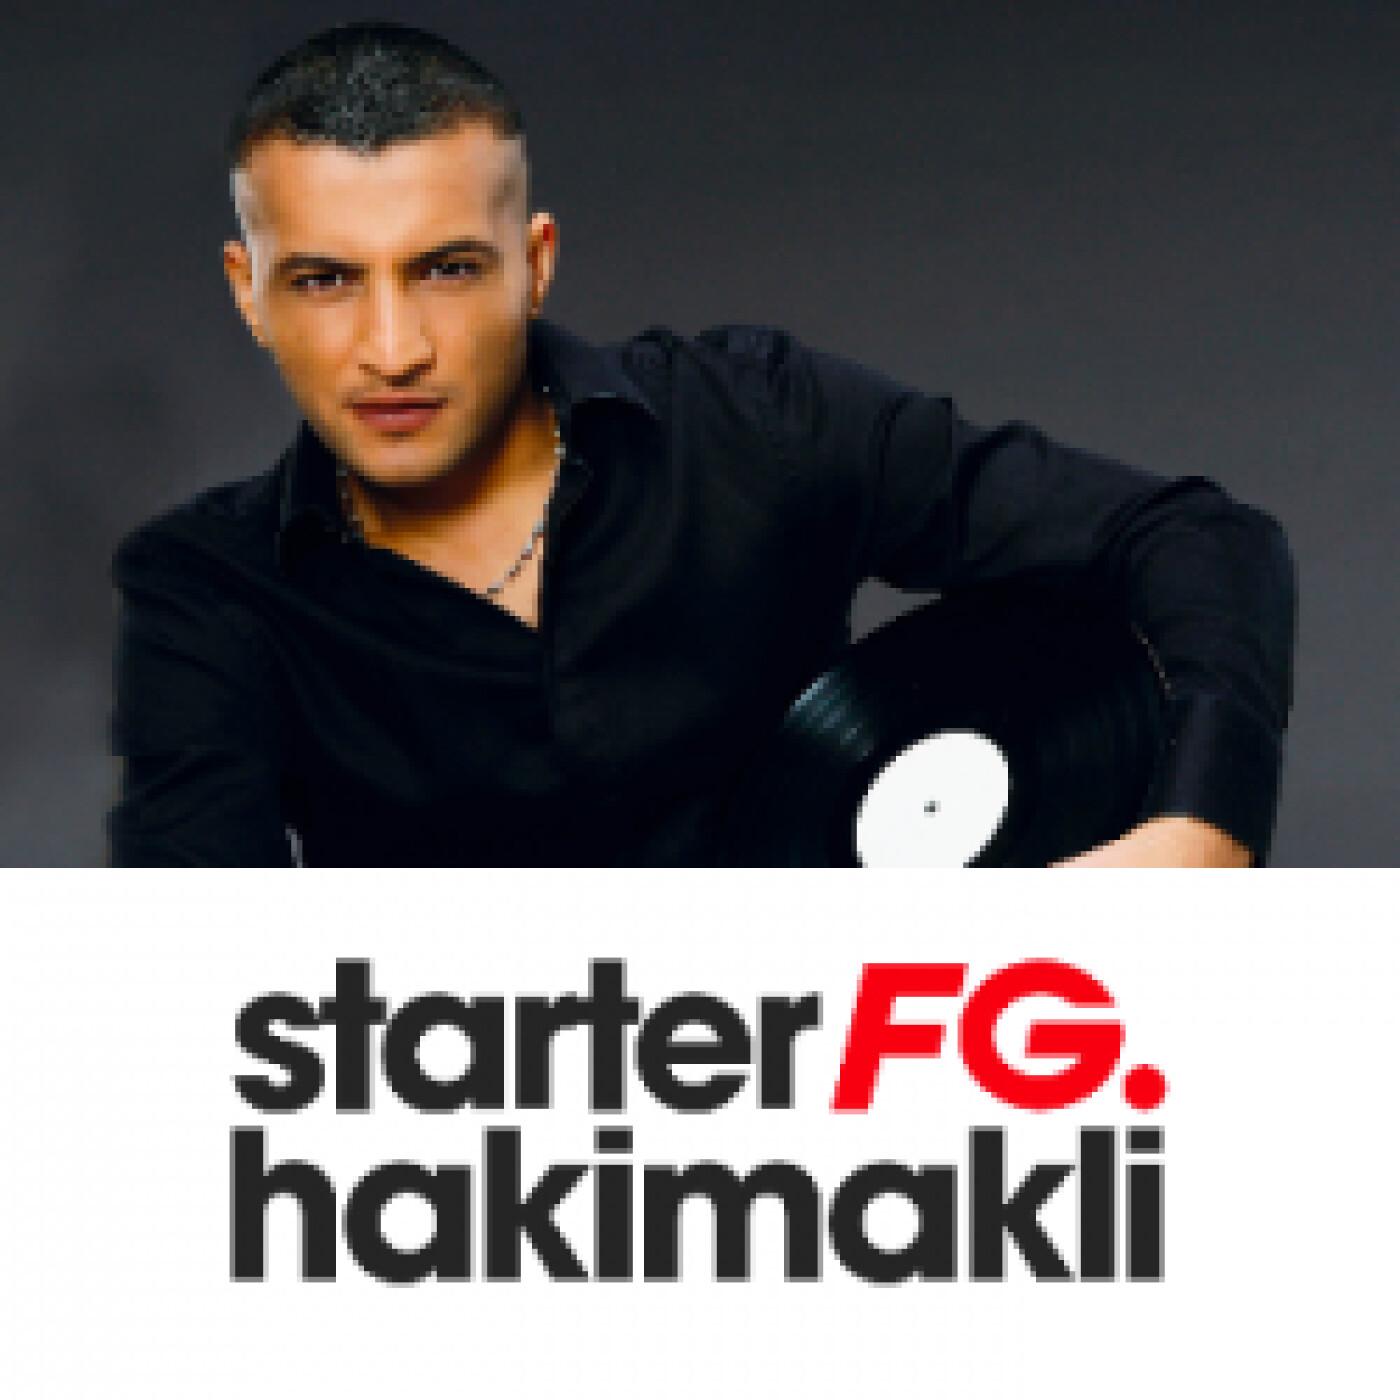 STARTER FG BY HAKIMAKLI JEUDI 3 JUIN 2021